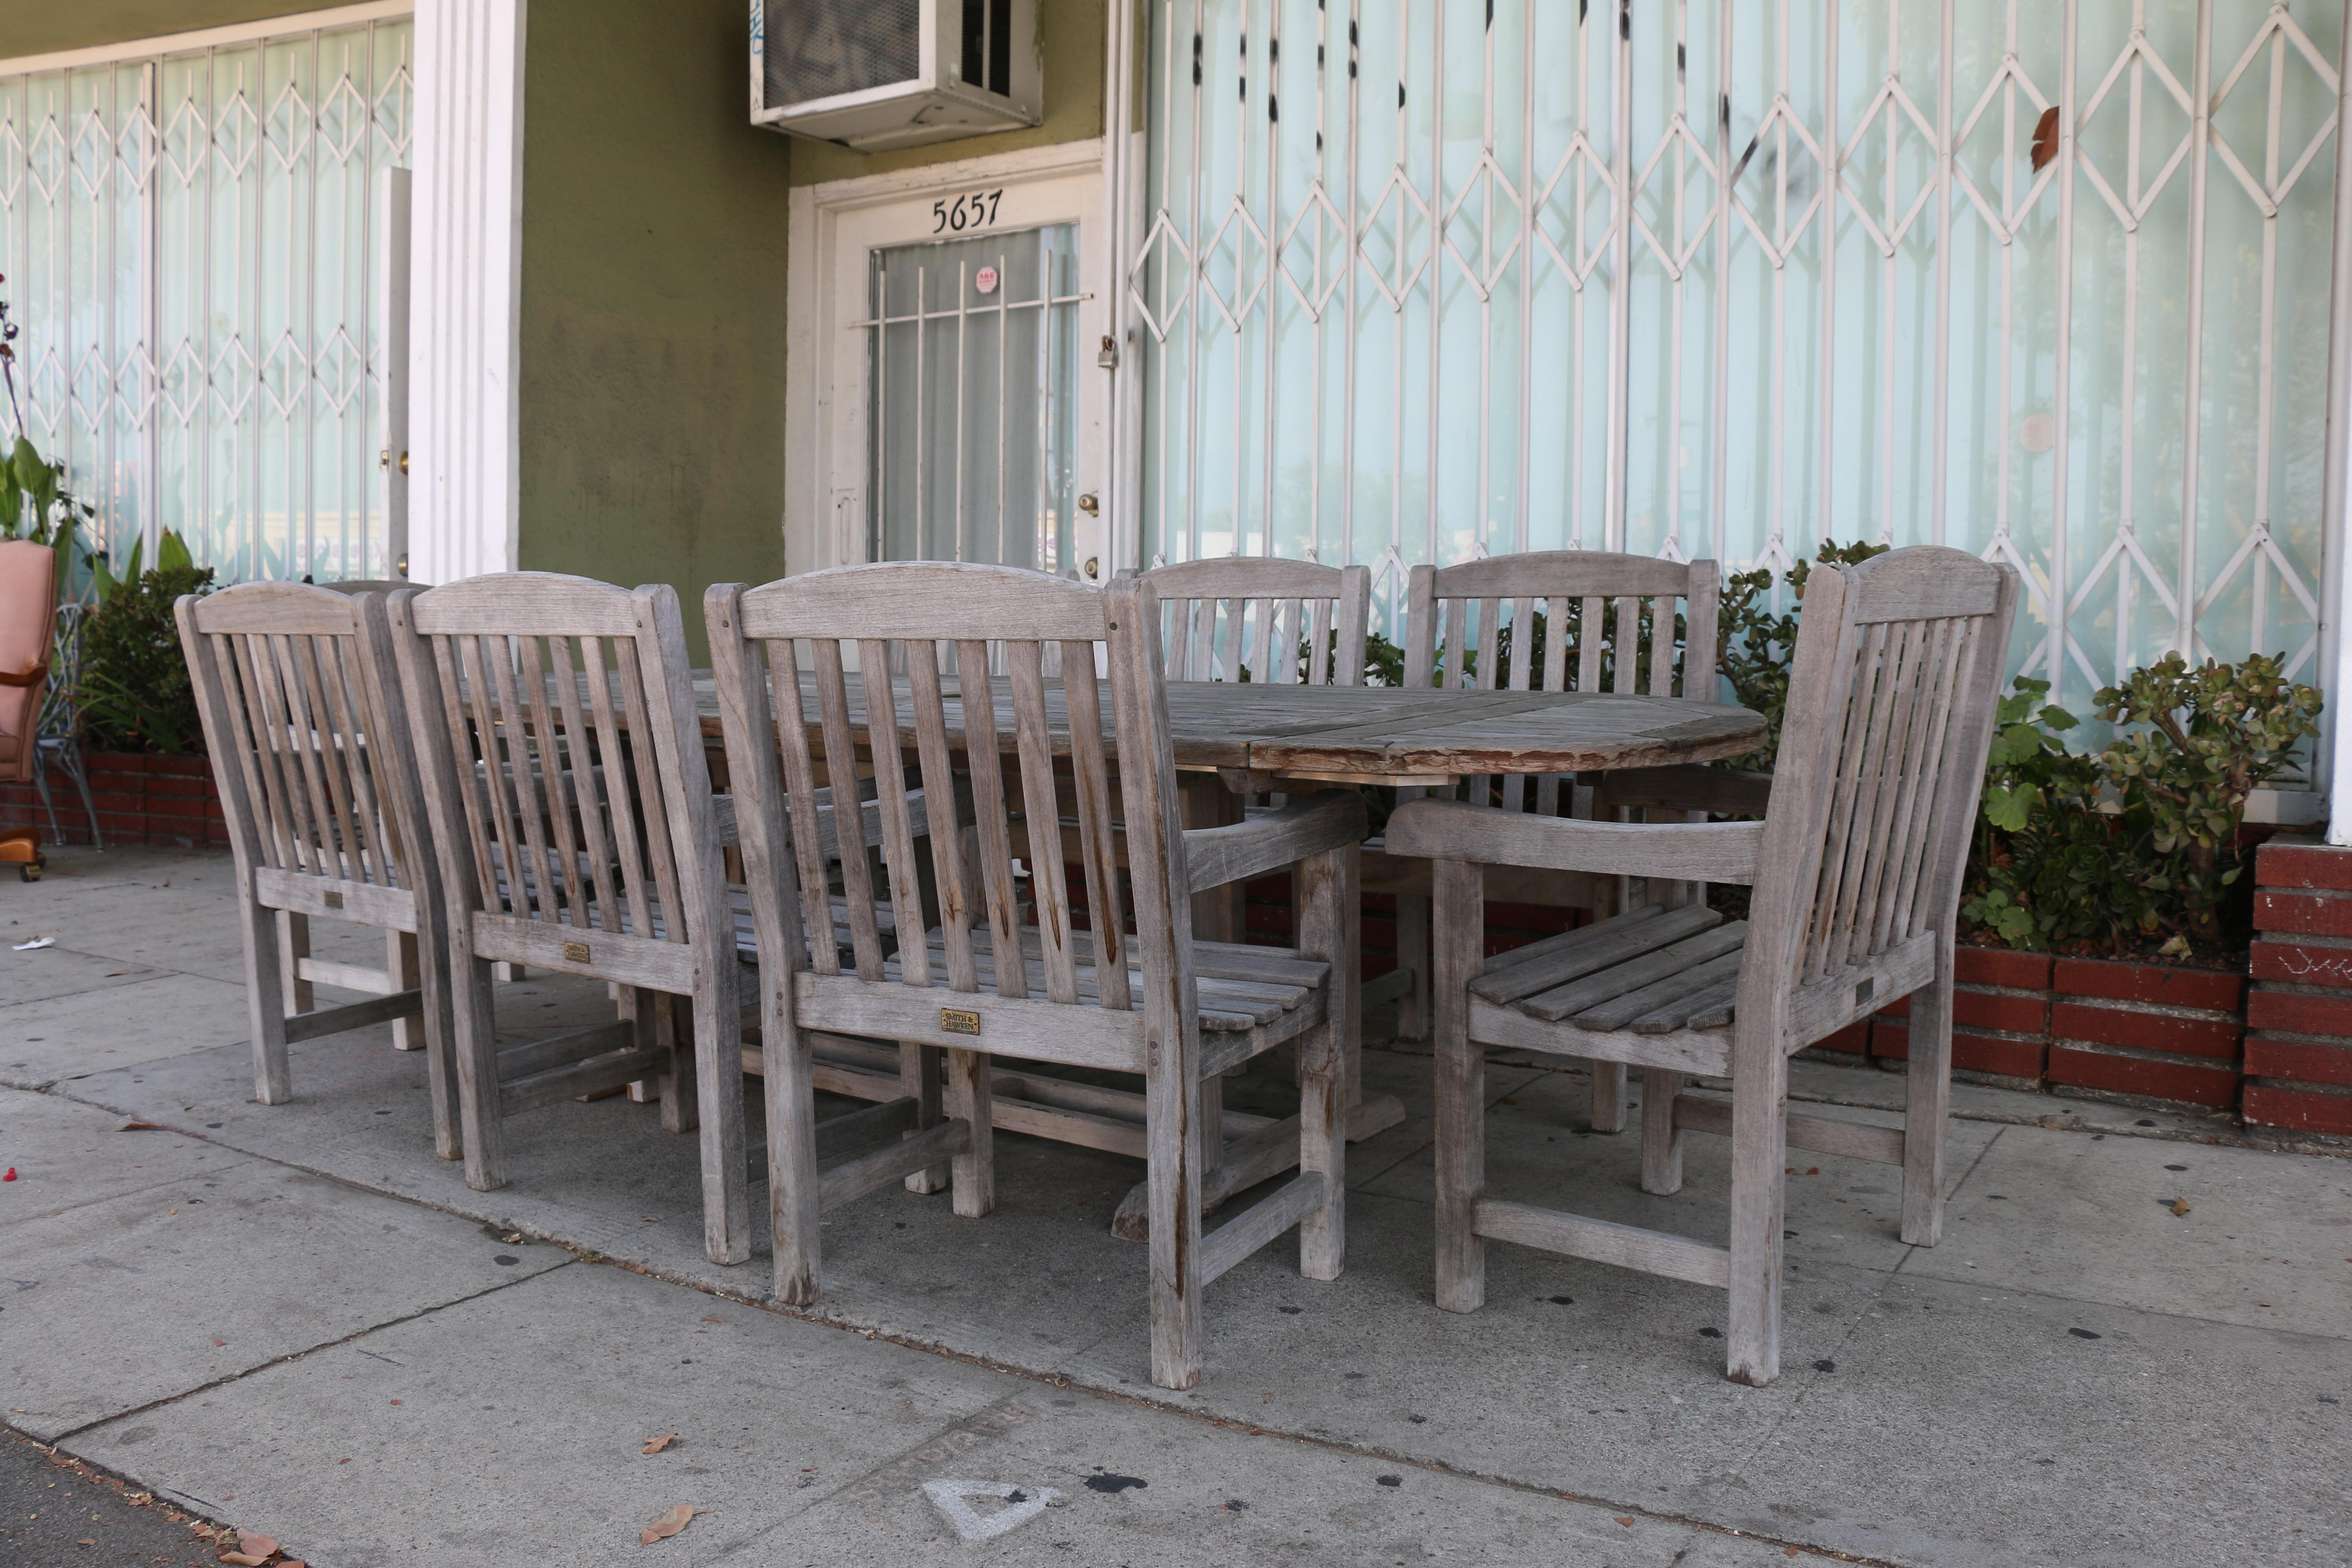 vintage smith and hawken teak outdoor patio set chairish rh chairish com Outdoor Metal Furniture Smith & Hawken Catalog